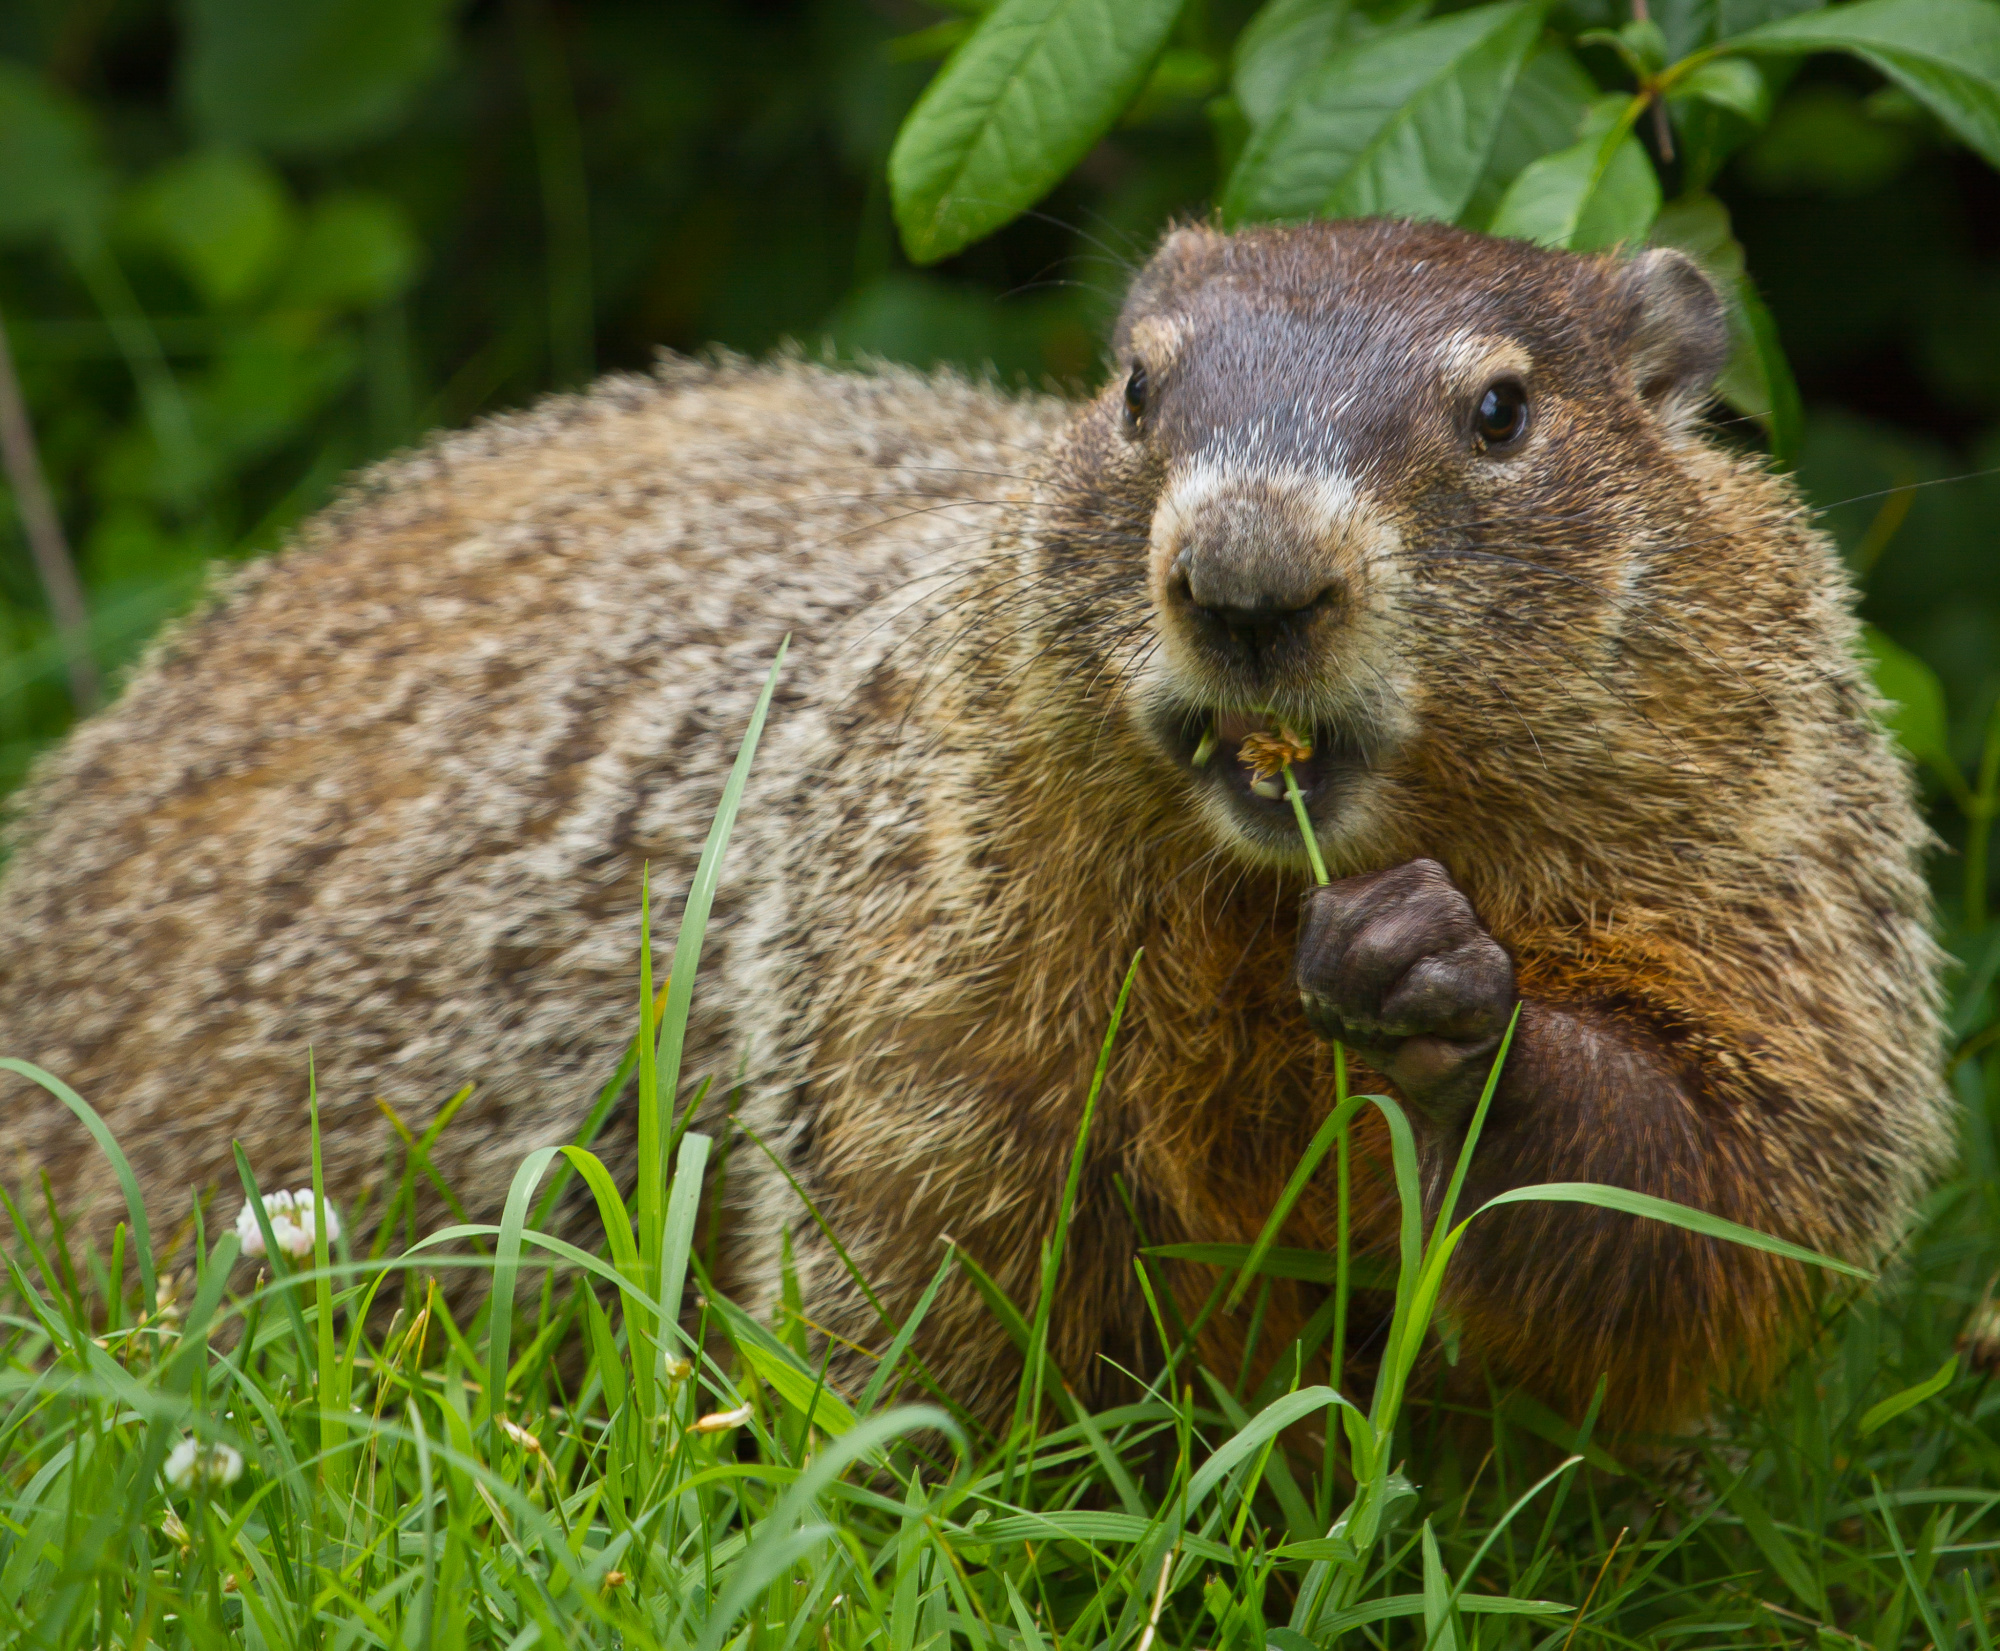 A groundhog eating clover